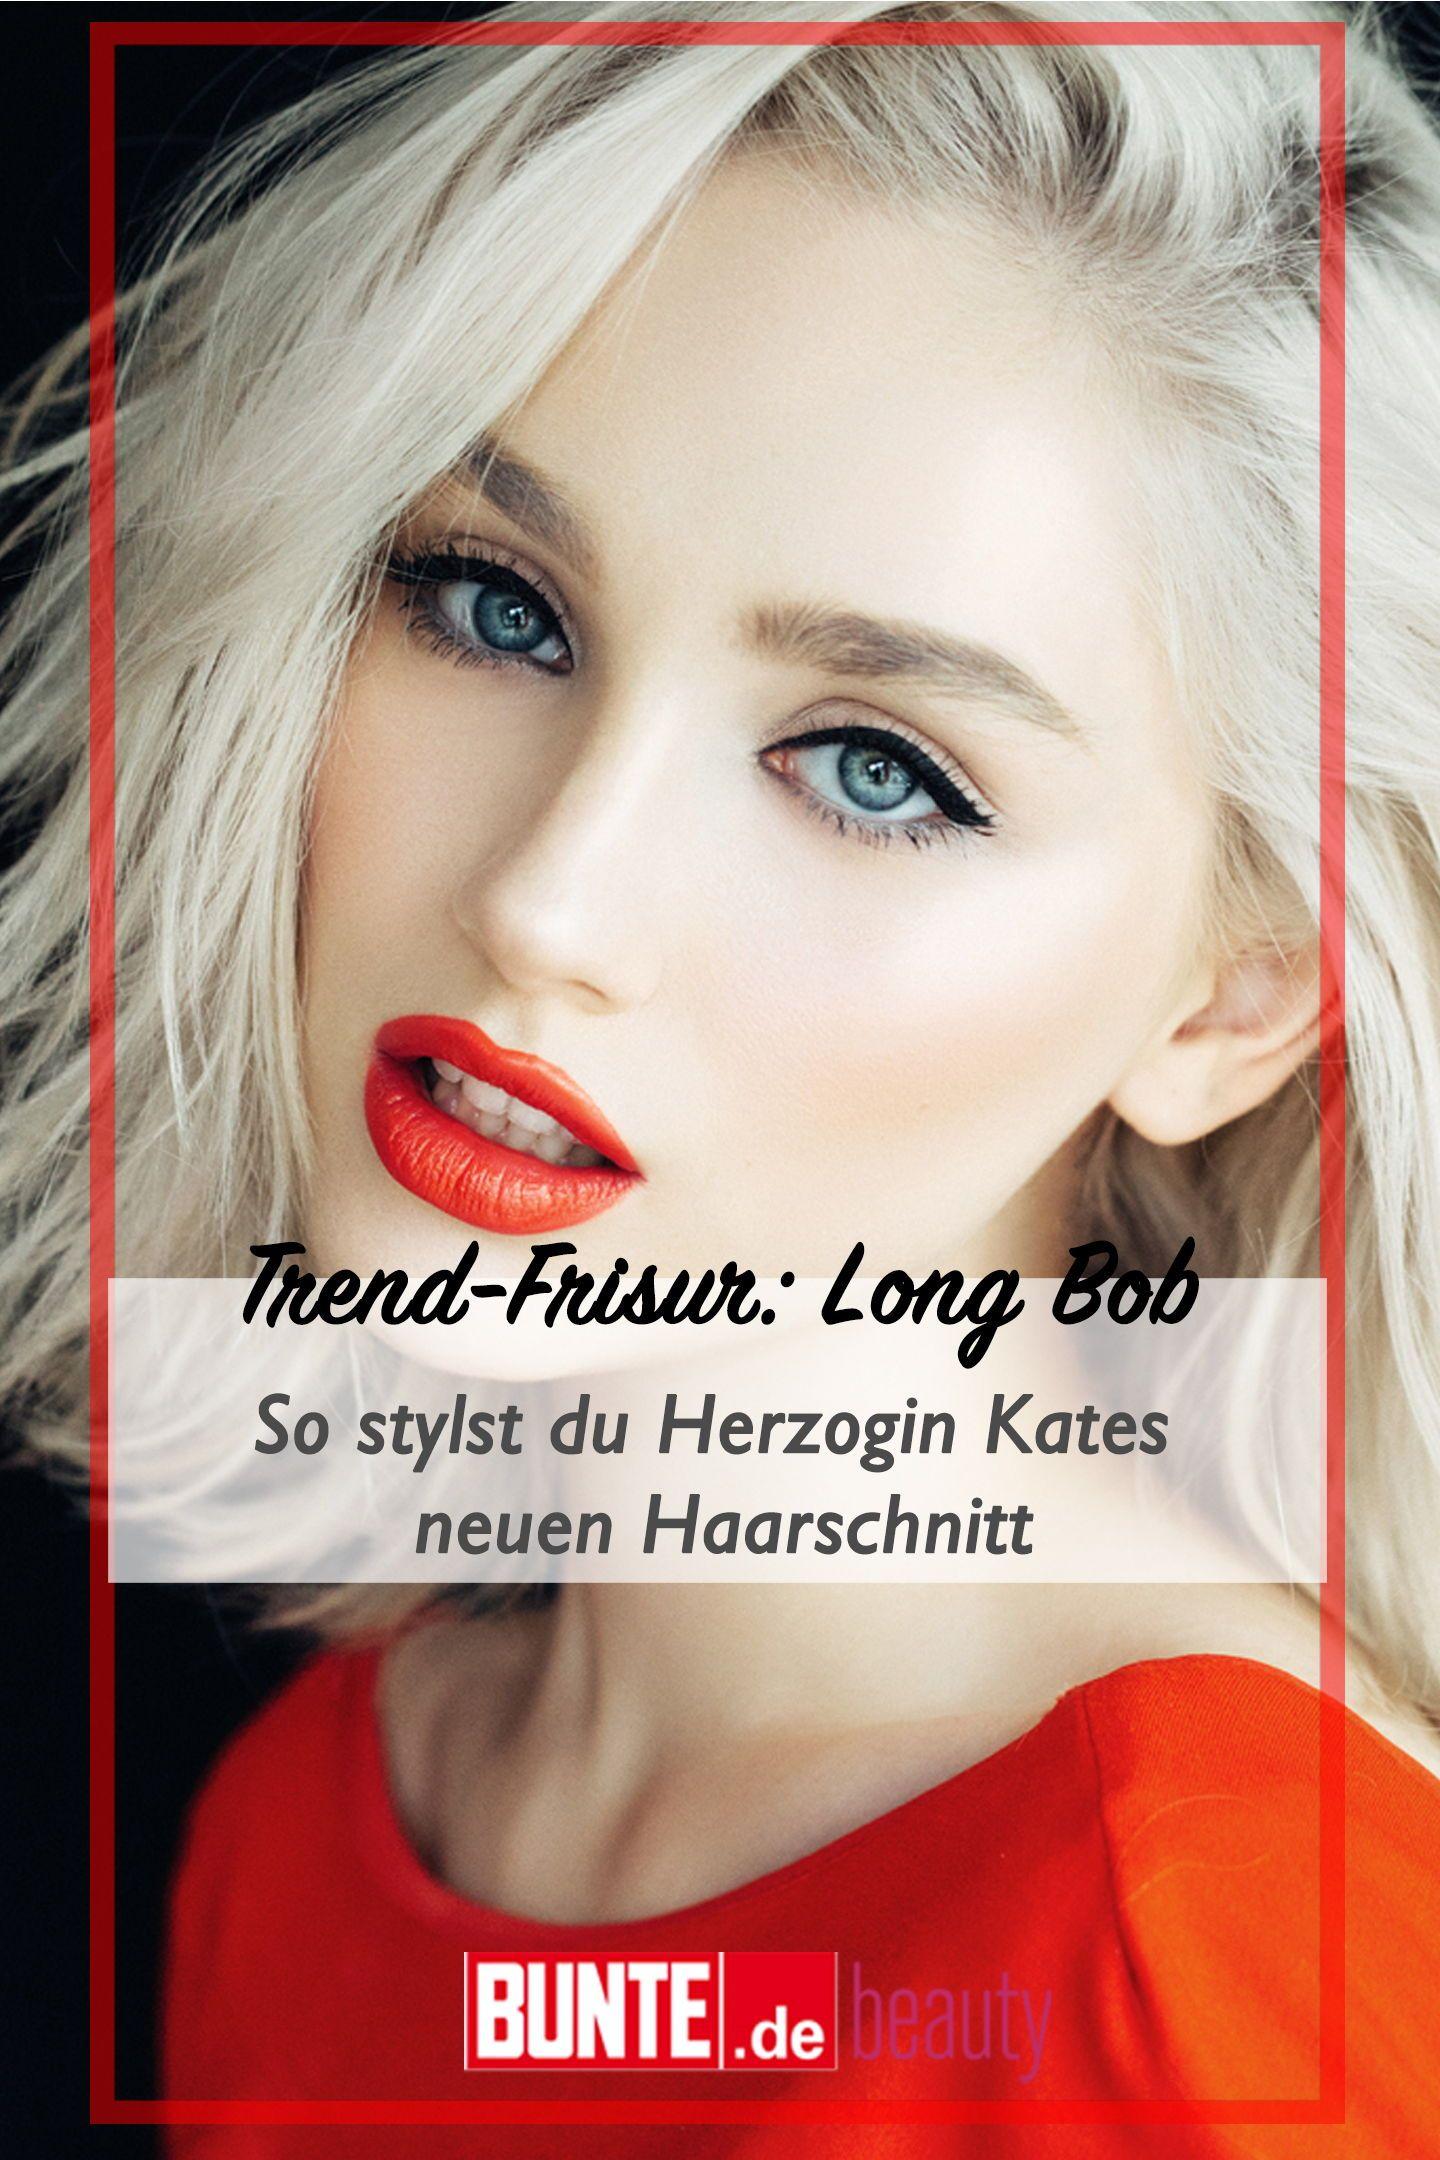 Trend Frisur Long Bob So Stylst Du Herzogin Kates Neuen Haarschnitt In 2020 Neue Haarschnitte Haare Frisuren